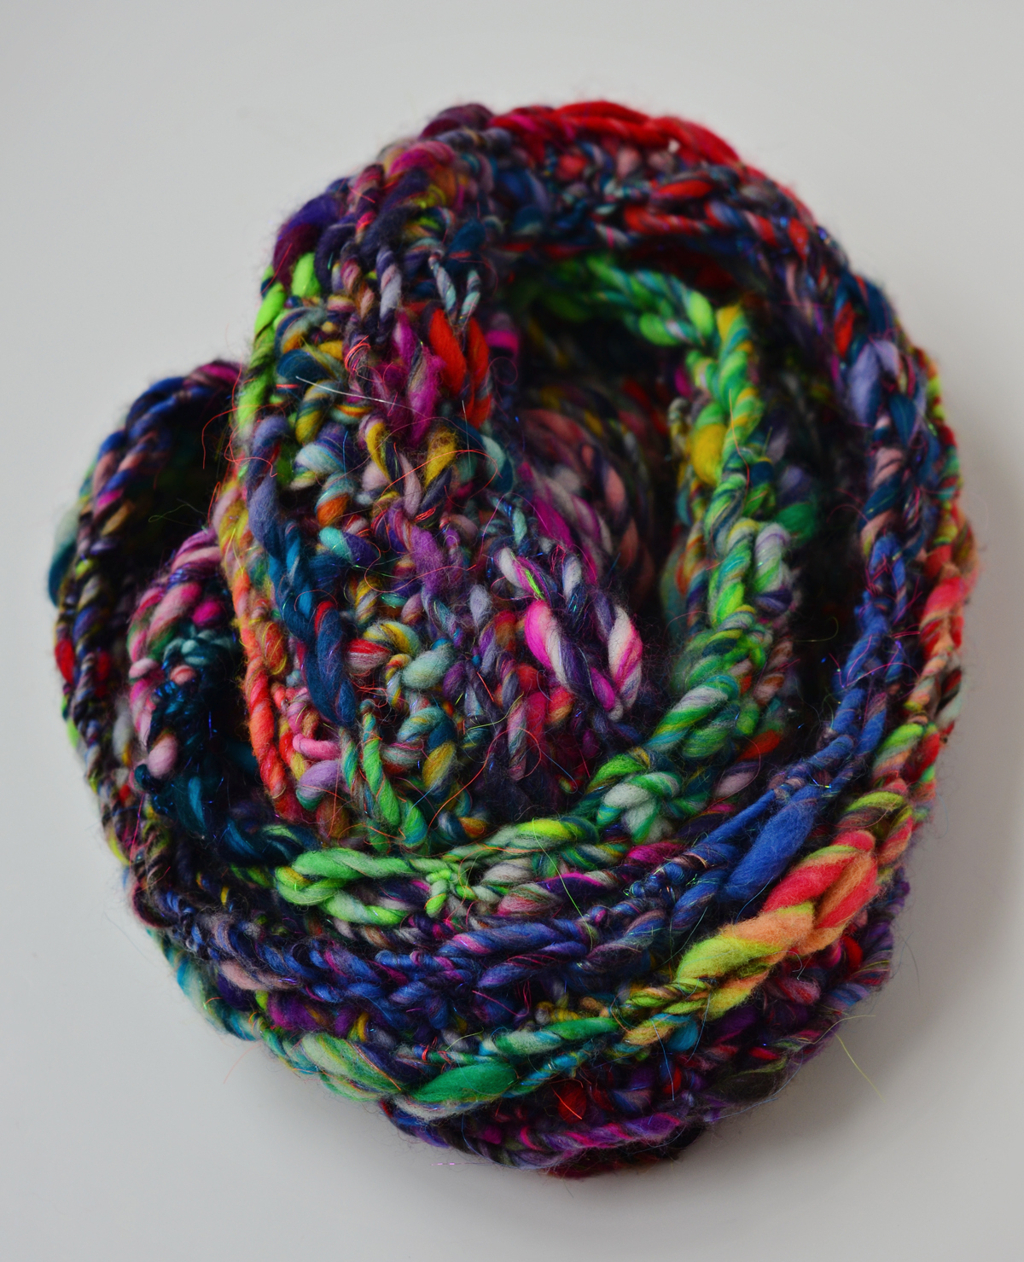 Crochet Loop Infinity Scarf Using Bulky Handspun Art Yarn